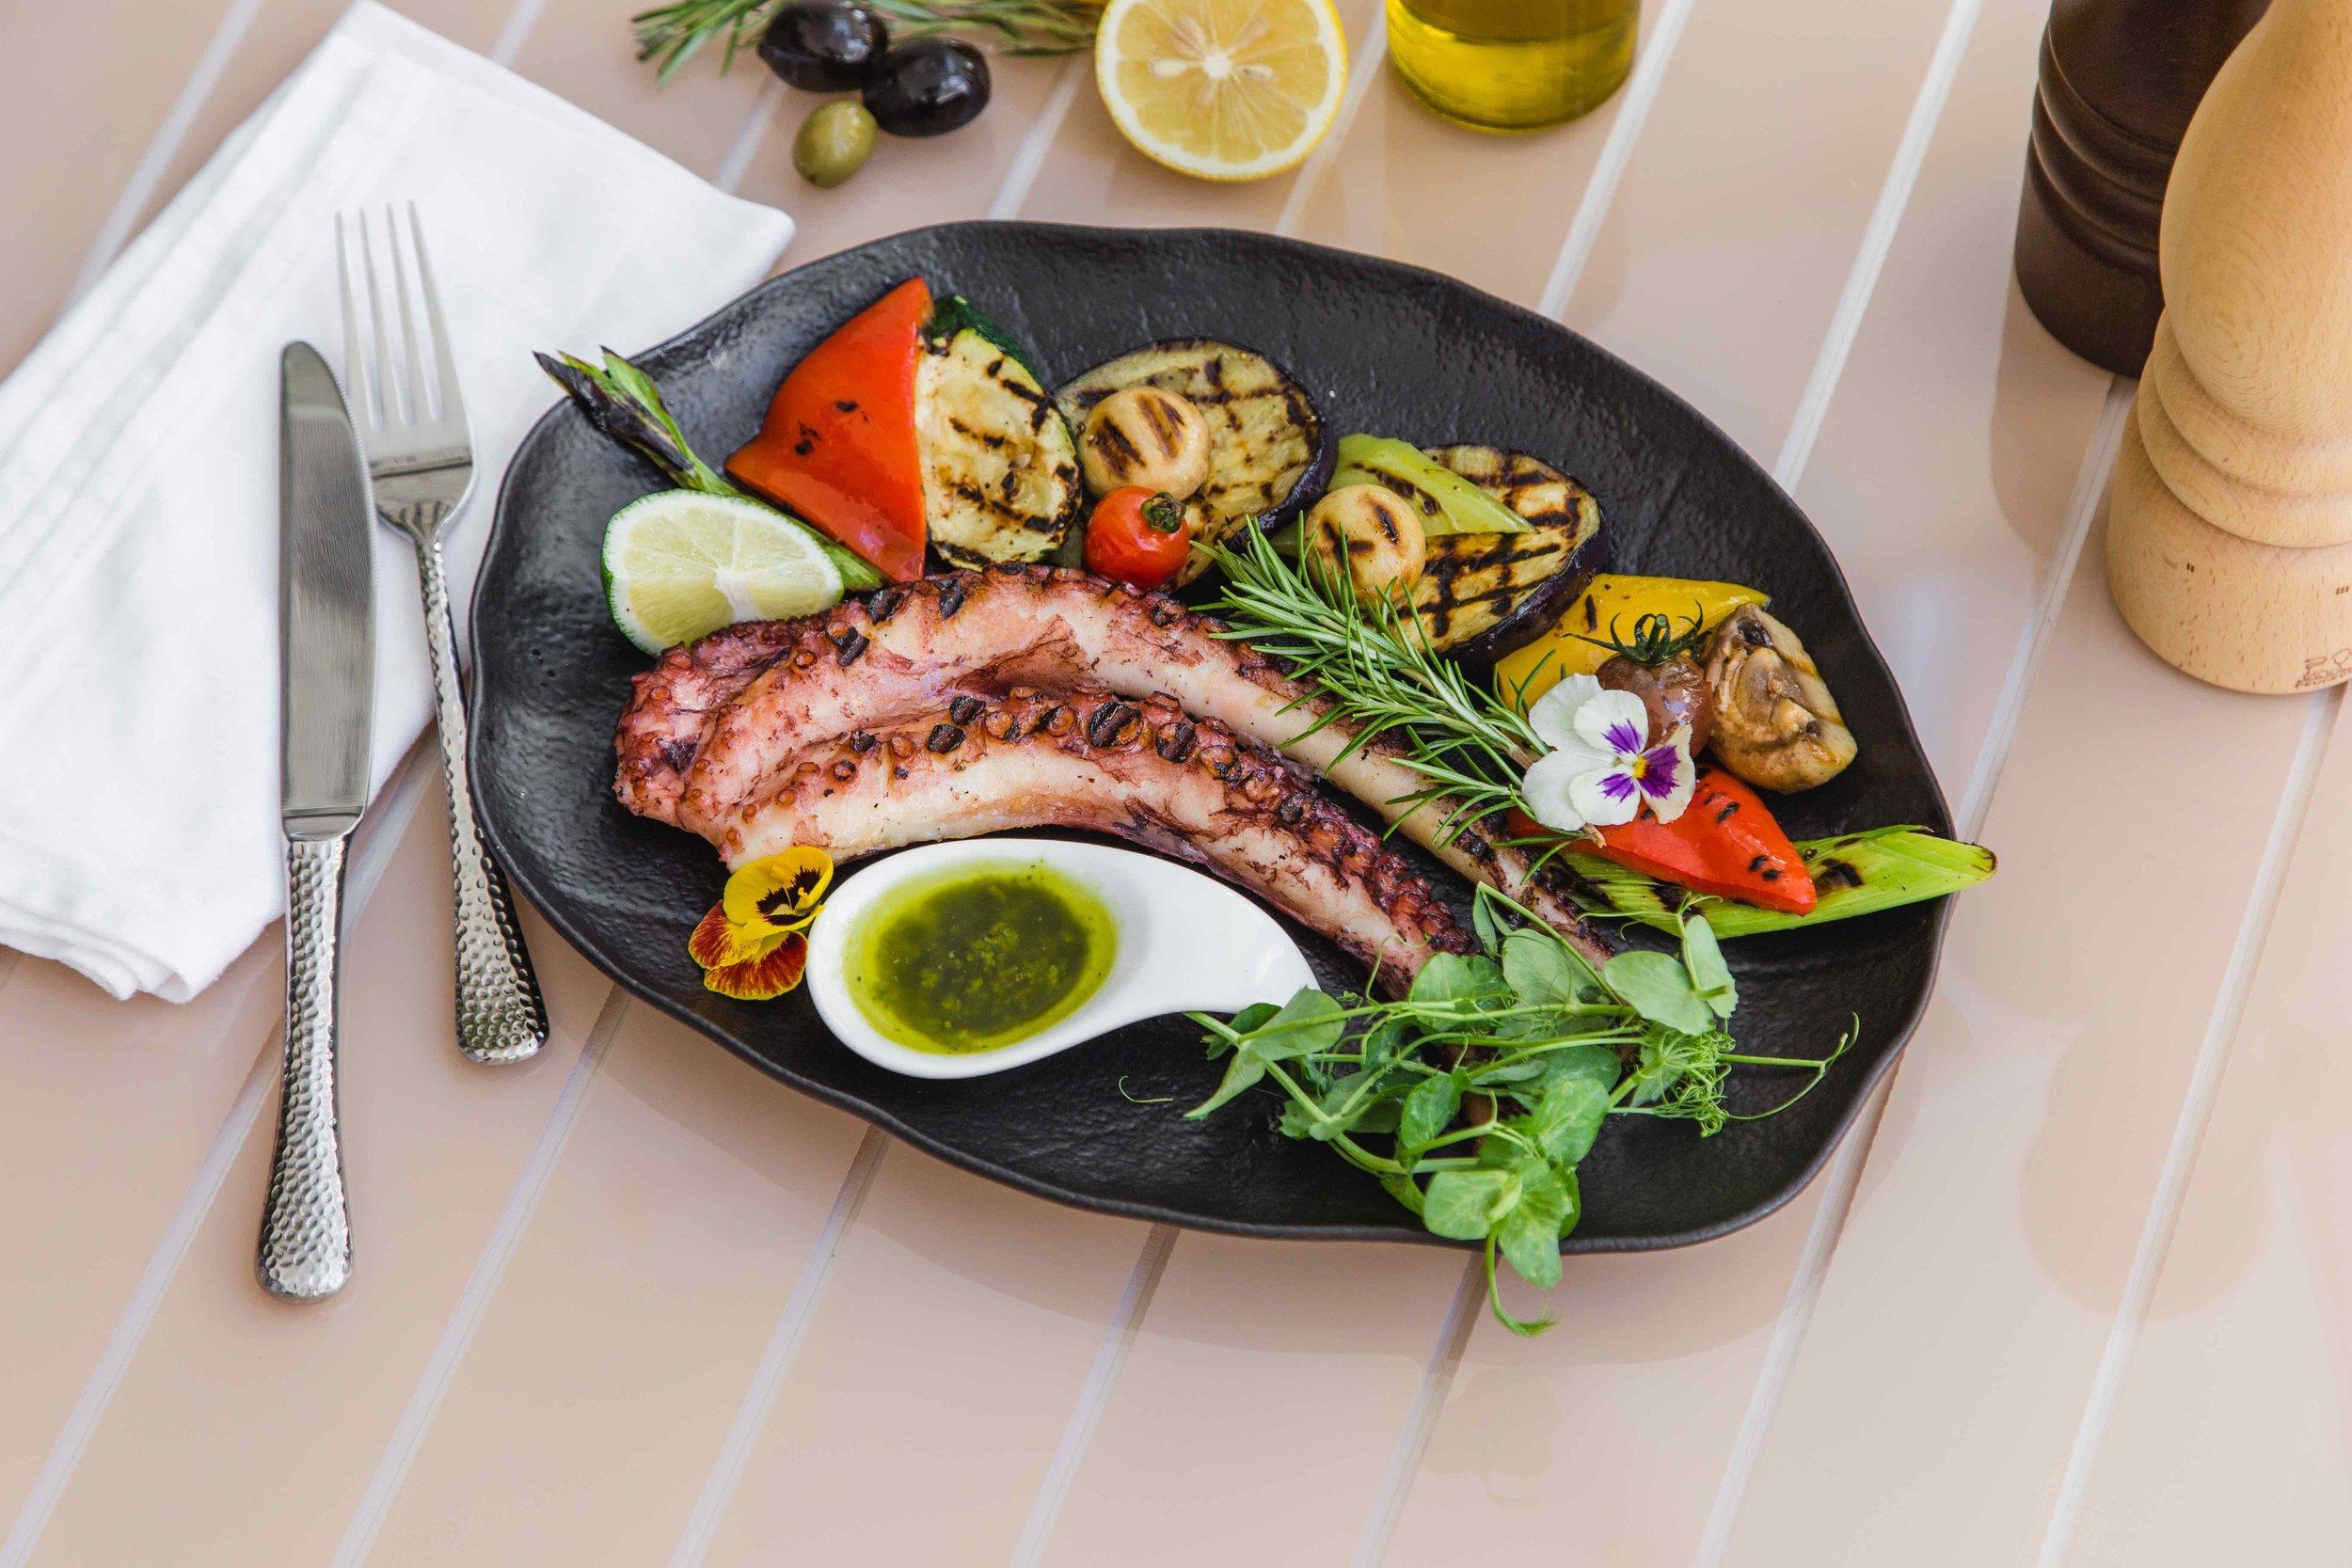 Anatolia Lounge Cafe | New Becici | Montenegro | Budva | Restaurant | Pool | Food | Drinks 12328.jpeg